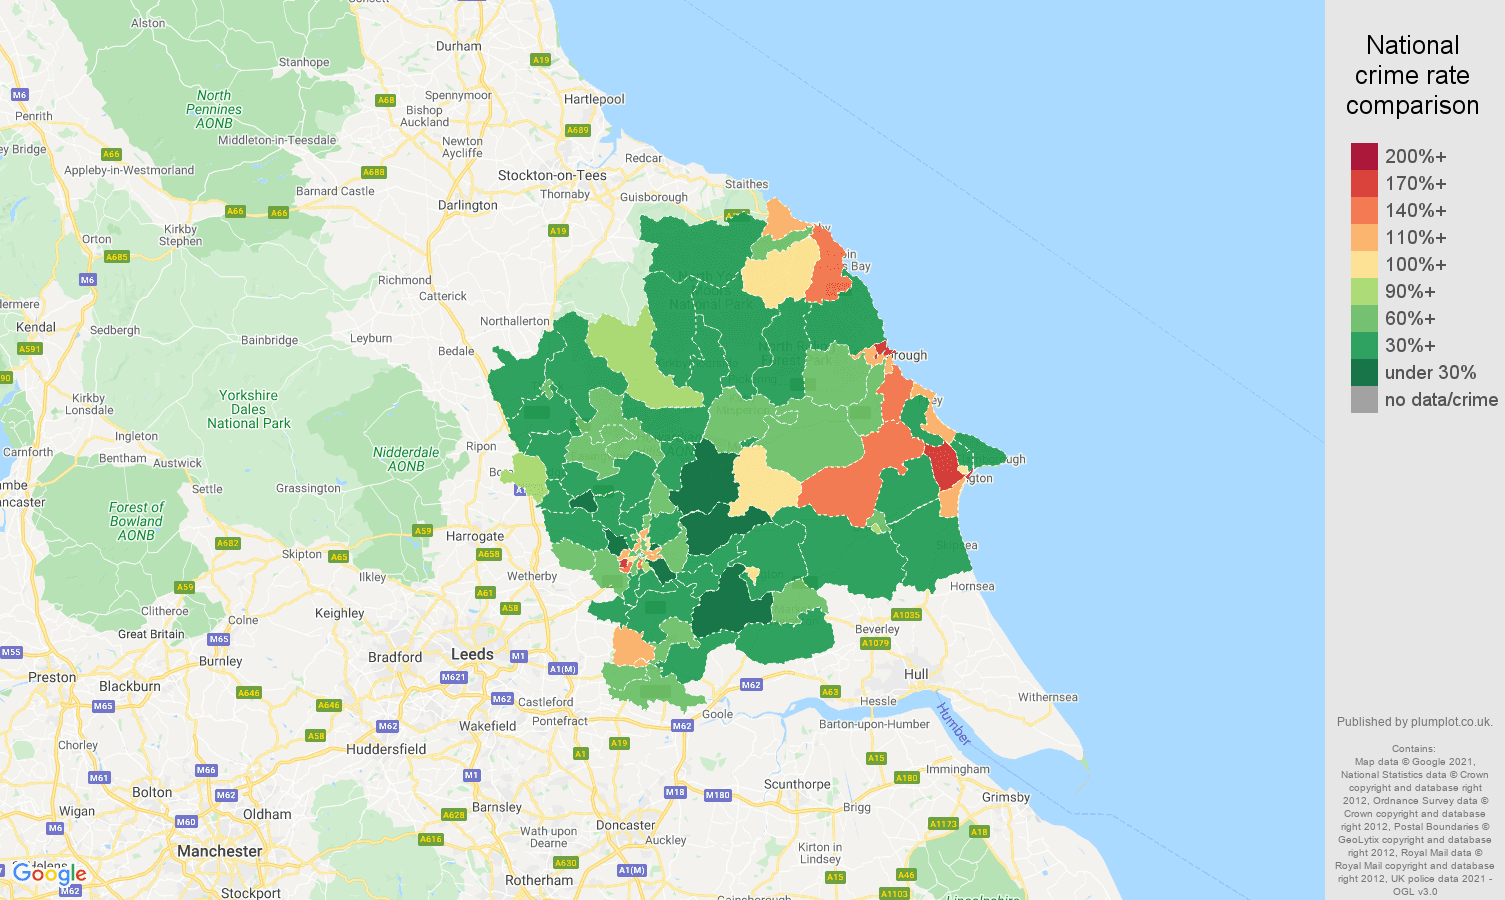 York criminal damage and arson crime rate comparison map